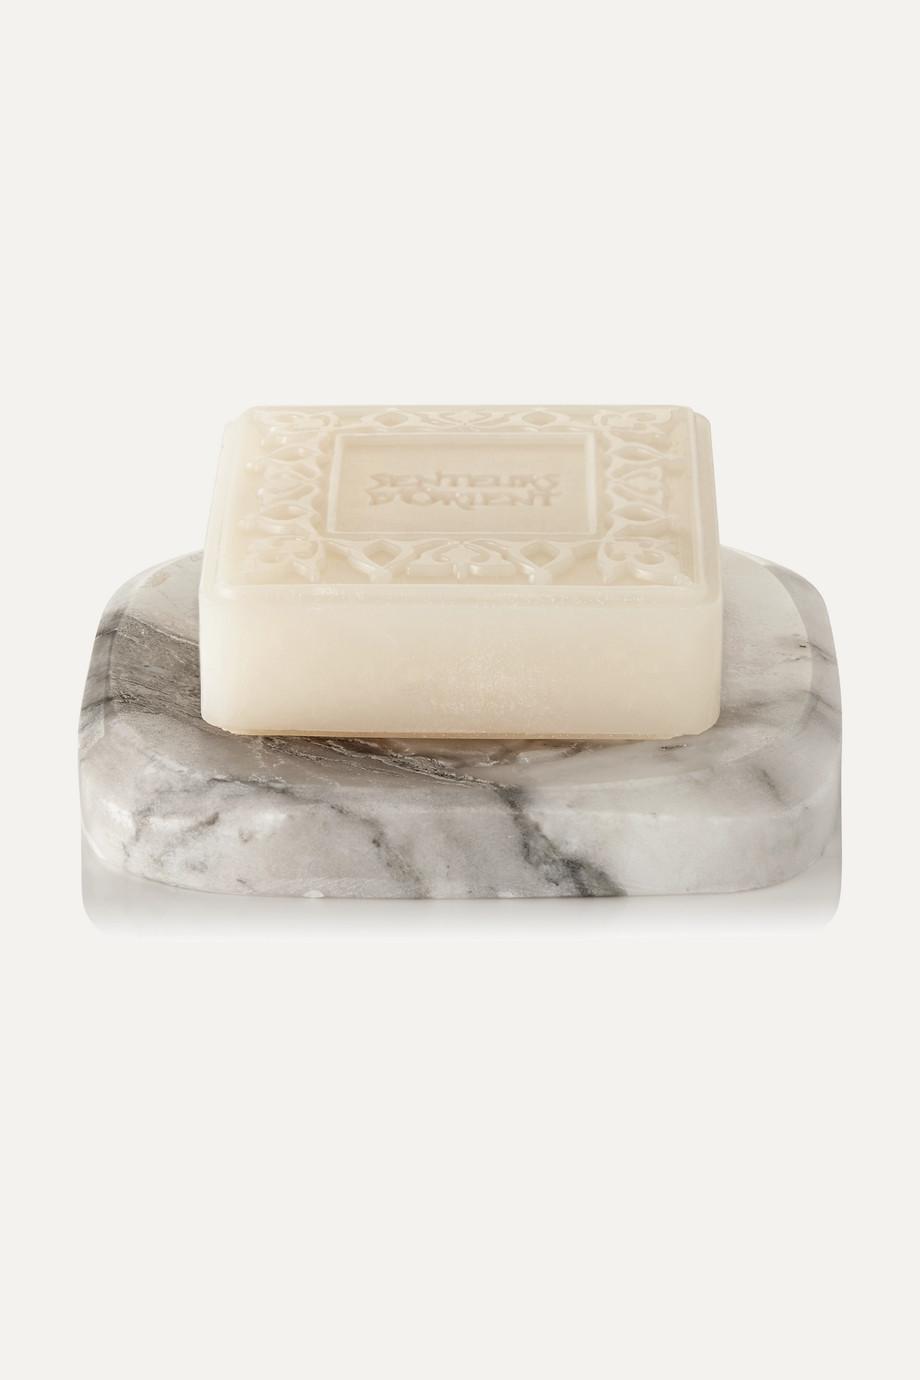 Senteurs d'Orient + NET SUSTAIN Orange Blossom Ma'amoul Soap with Marble Dish, 305g